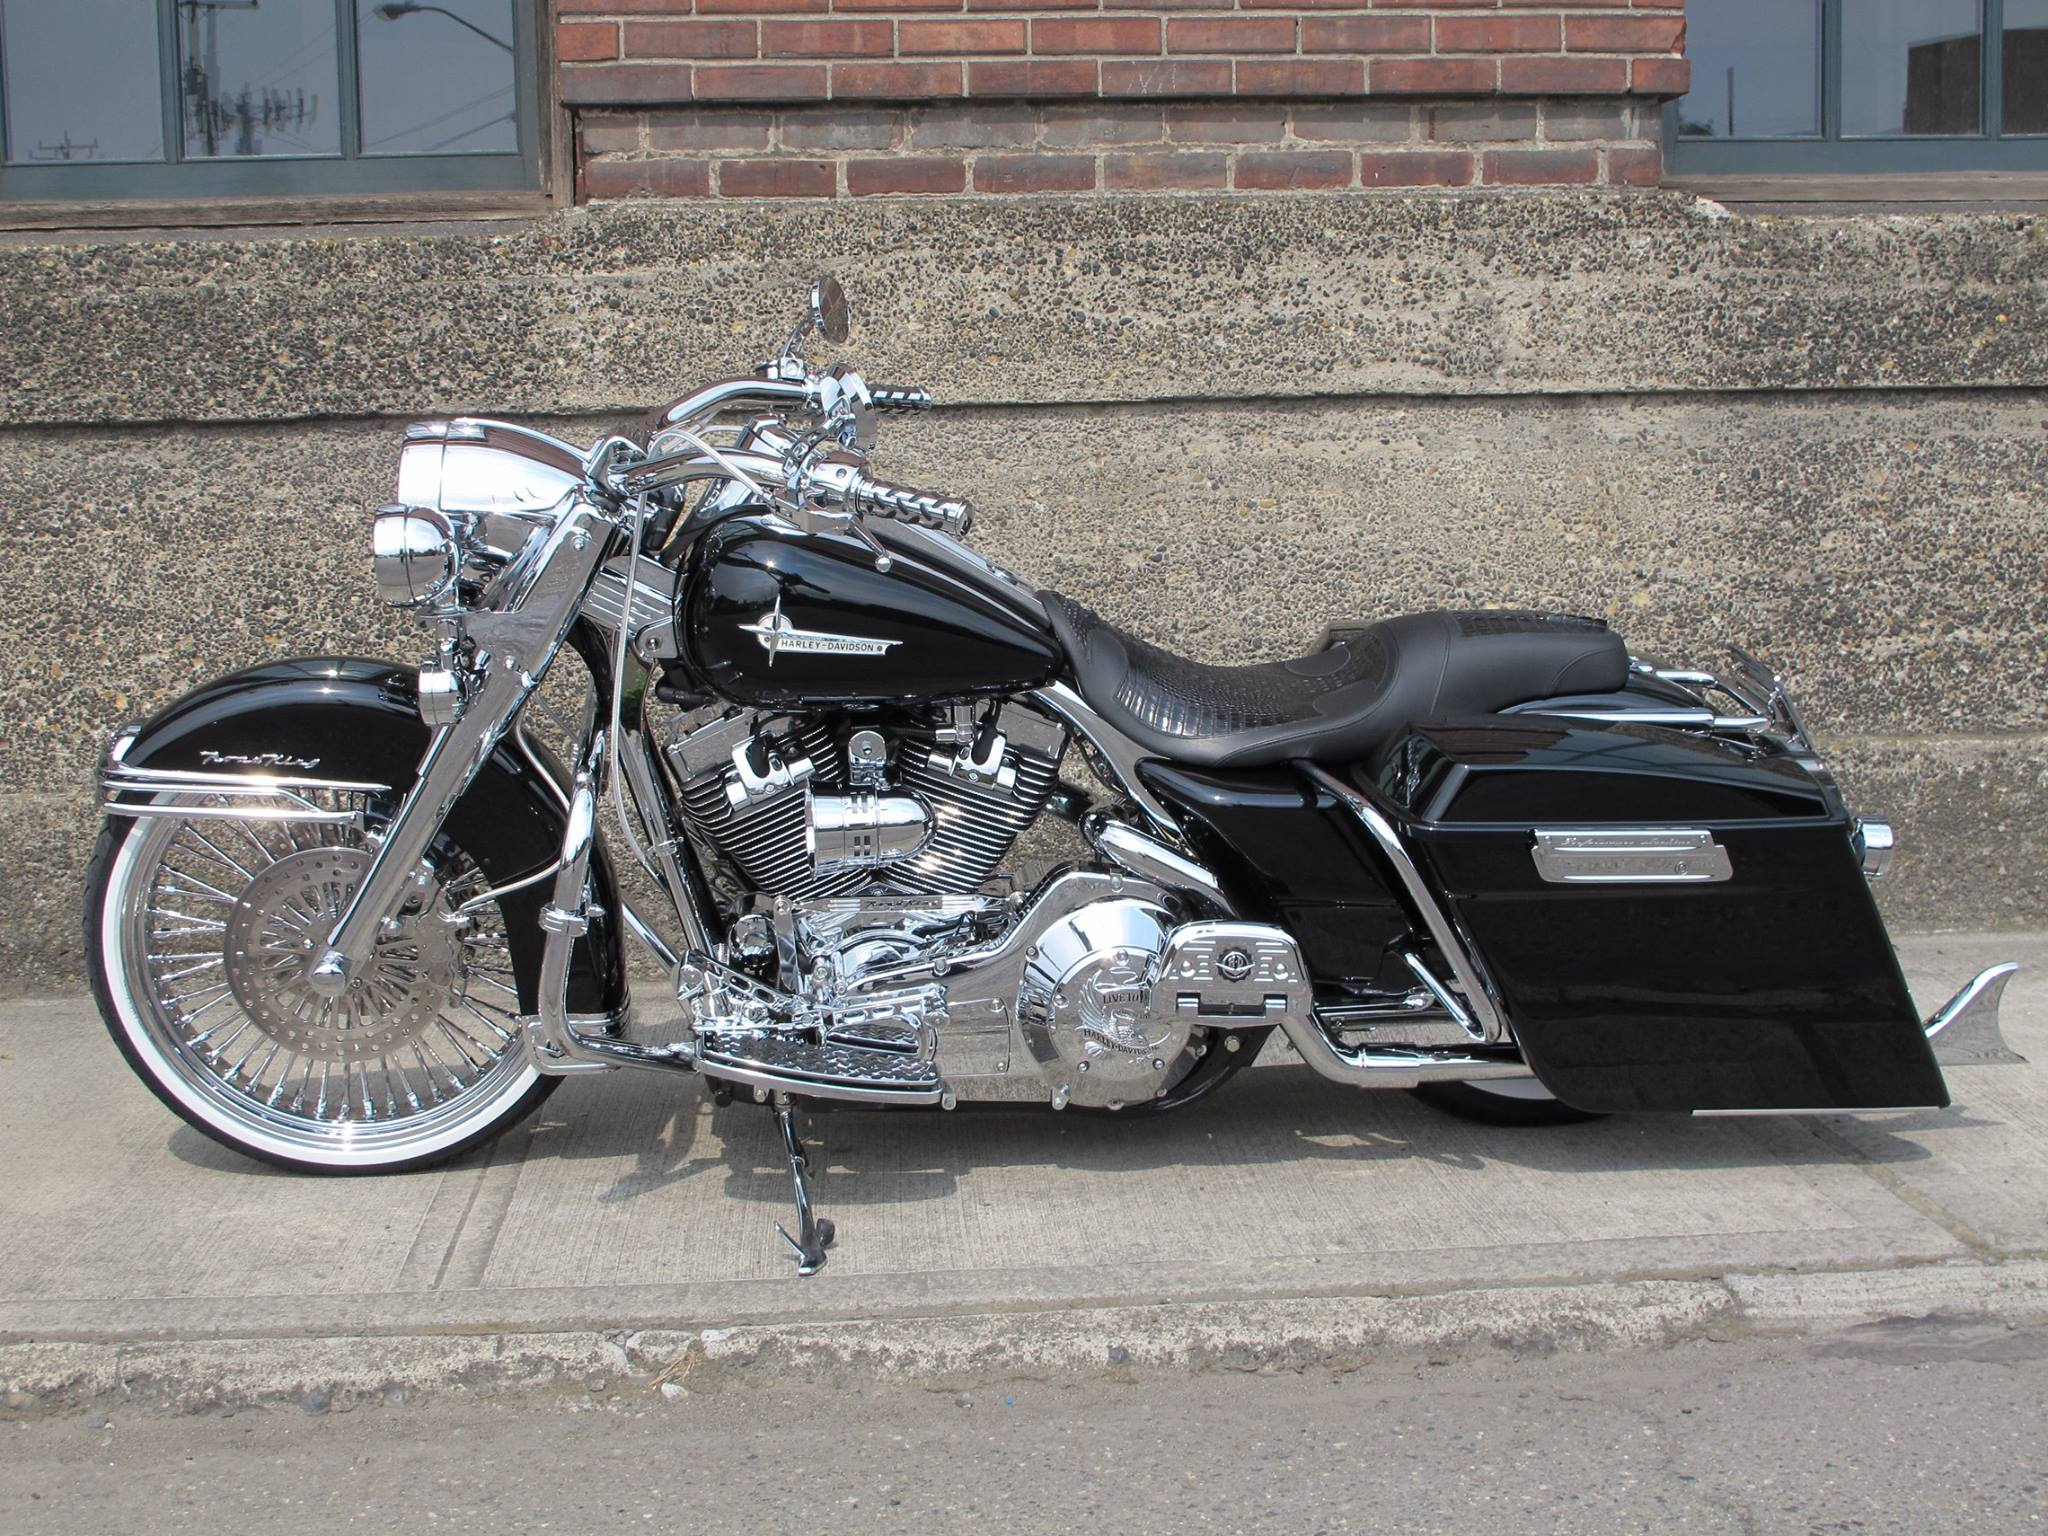 Harley Fat 50 da 21 pollici Anteriori